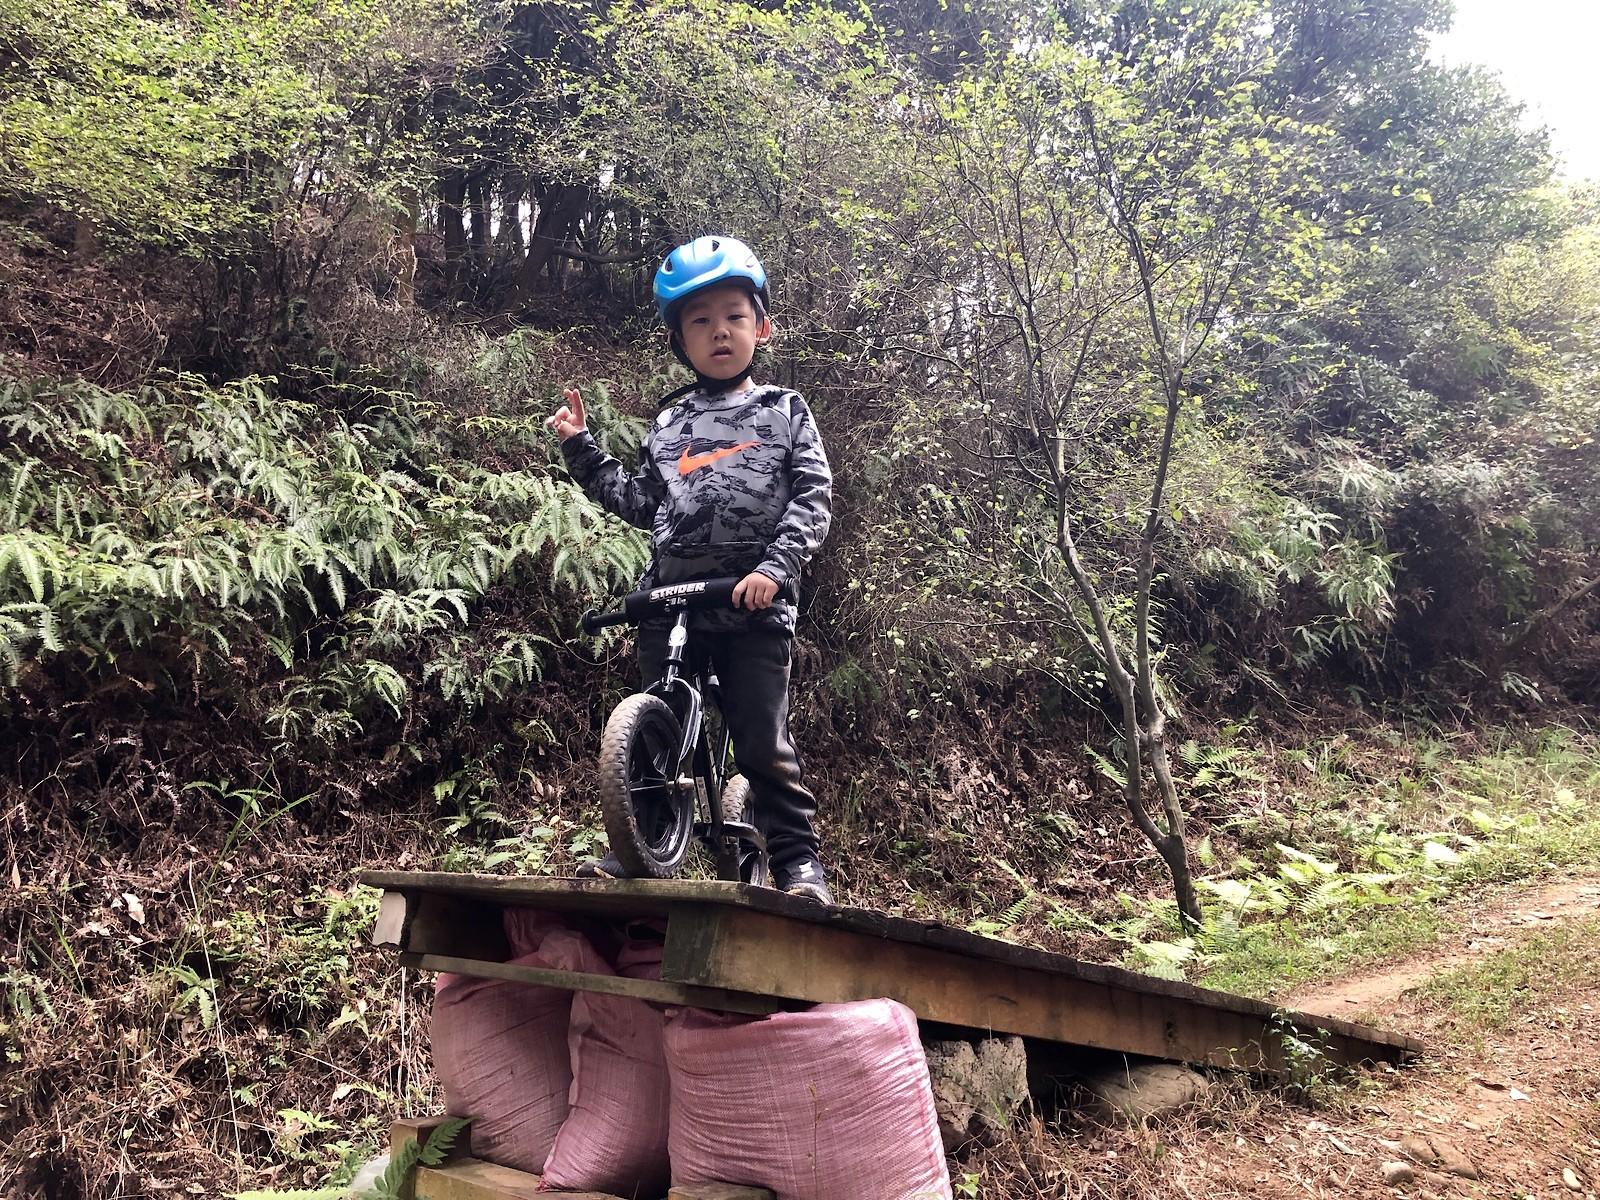 A5B975E4-0D56-4499-B8FF-D272DE493796 - Rickychang - Mountain Biking Pictures - Vital MTB